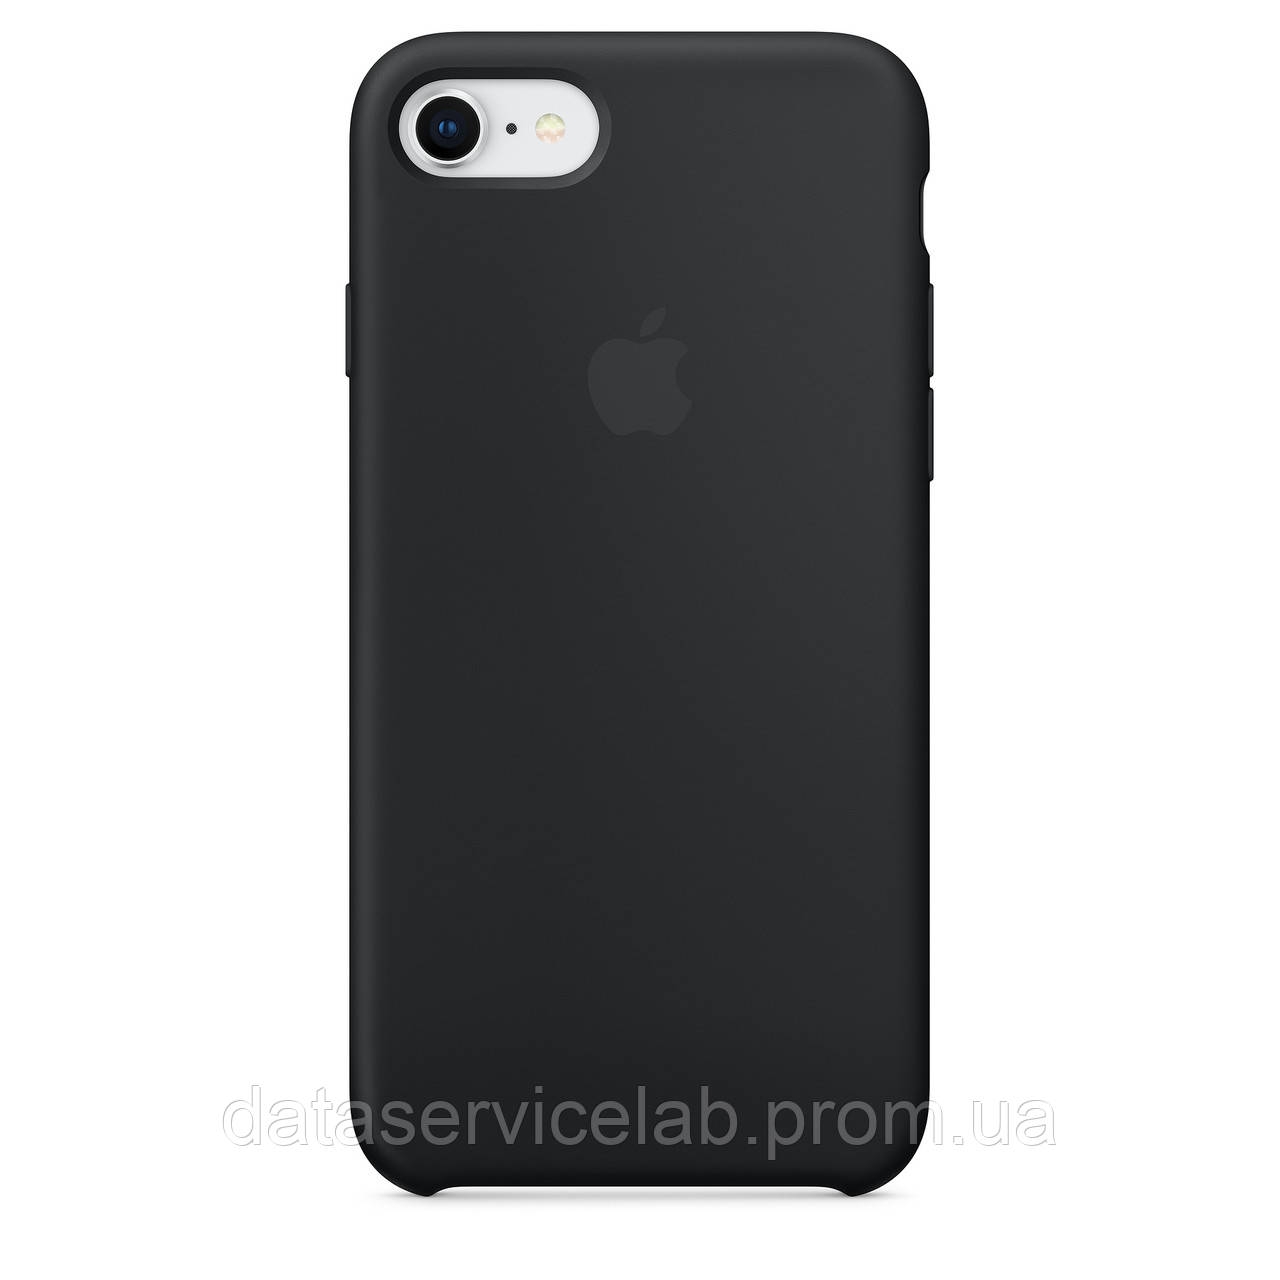 Чохол накладка дляіРһопе 7/8 Silicone Case Black